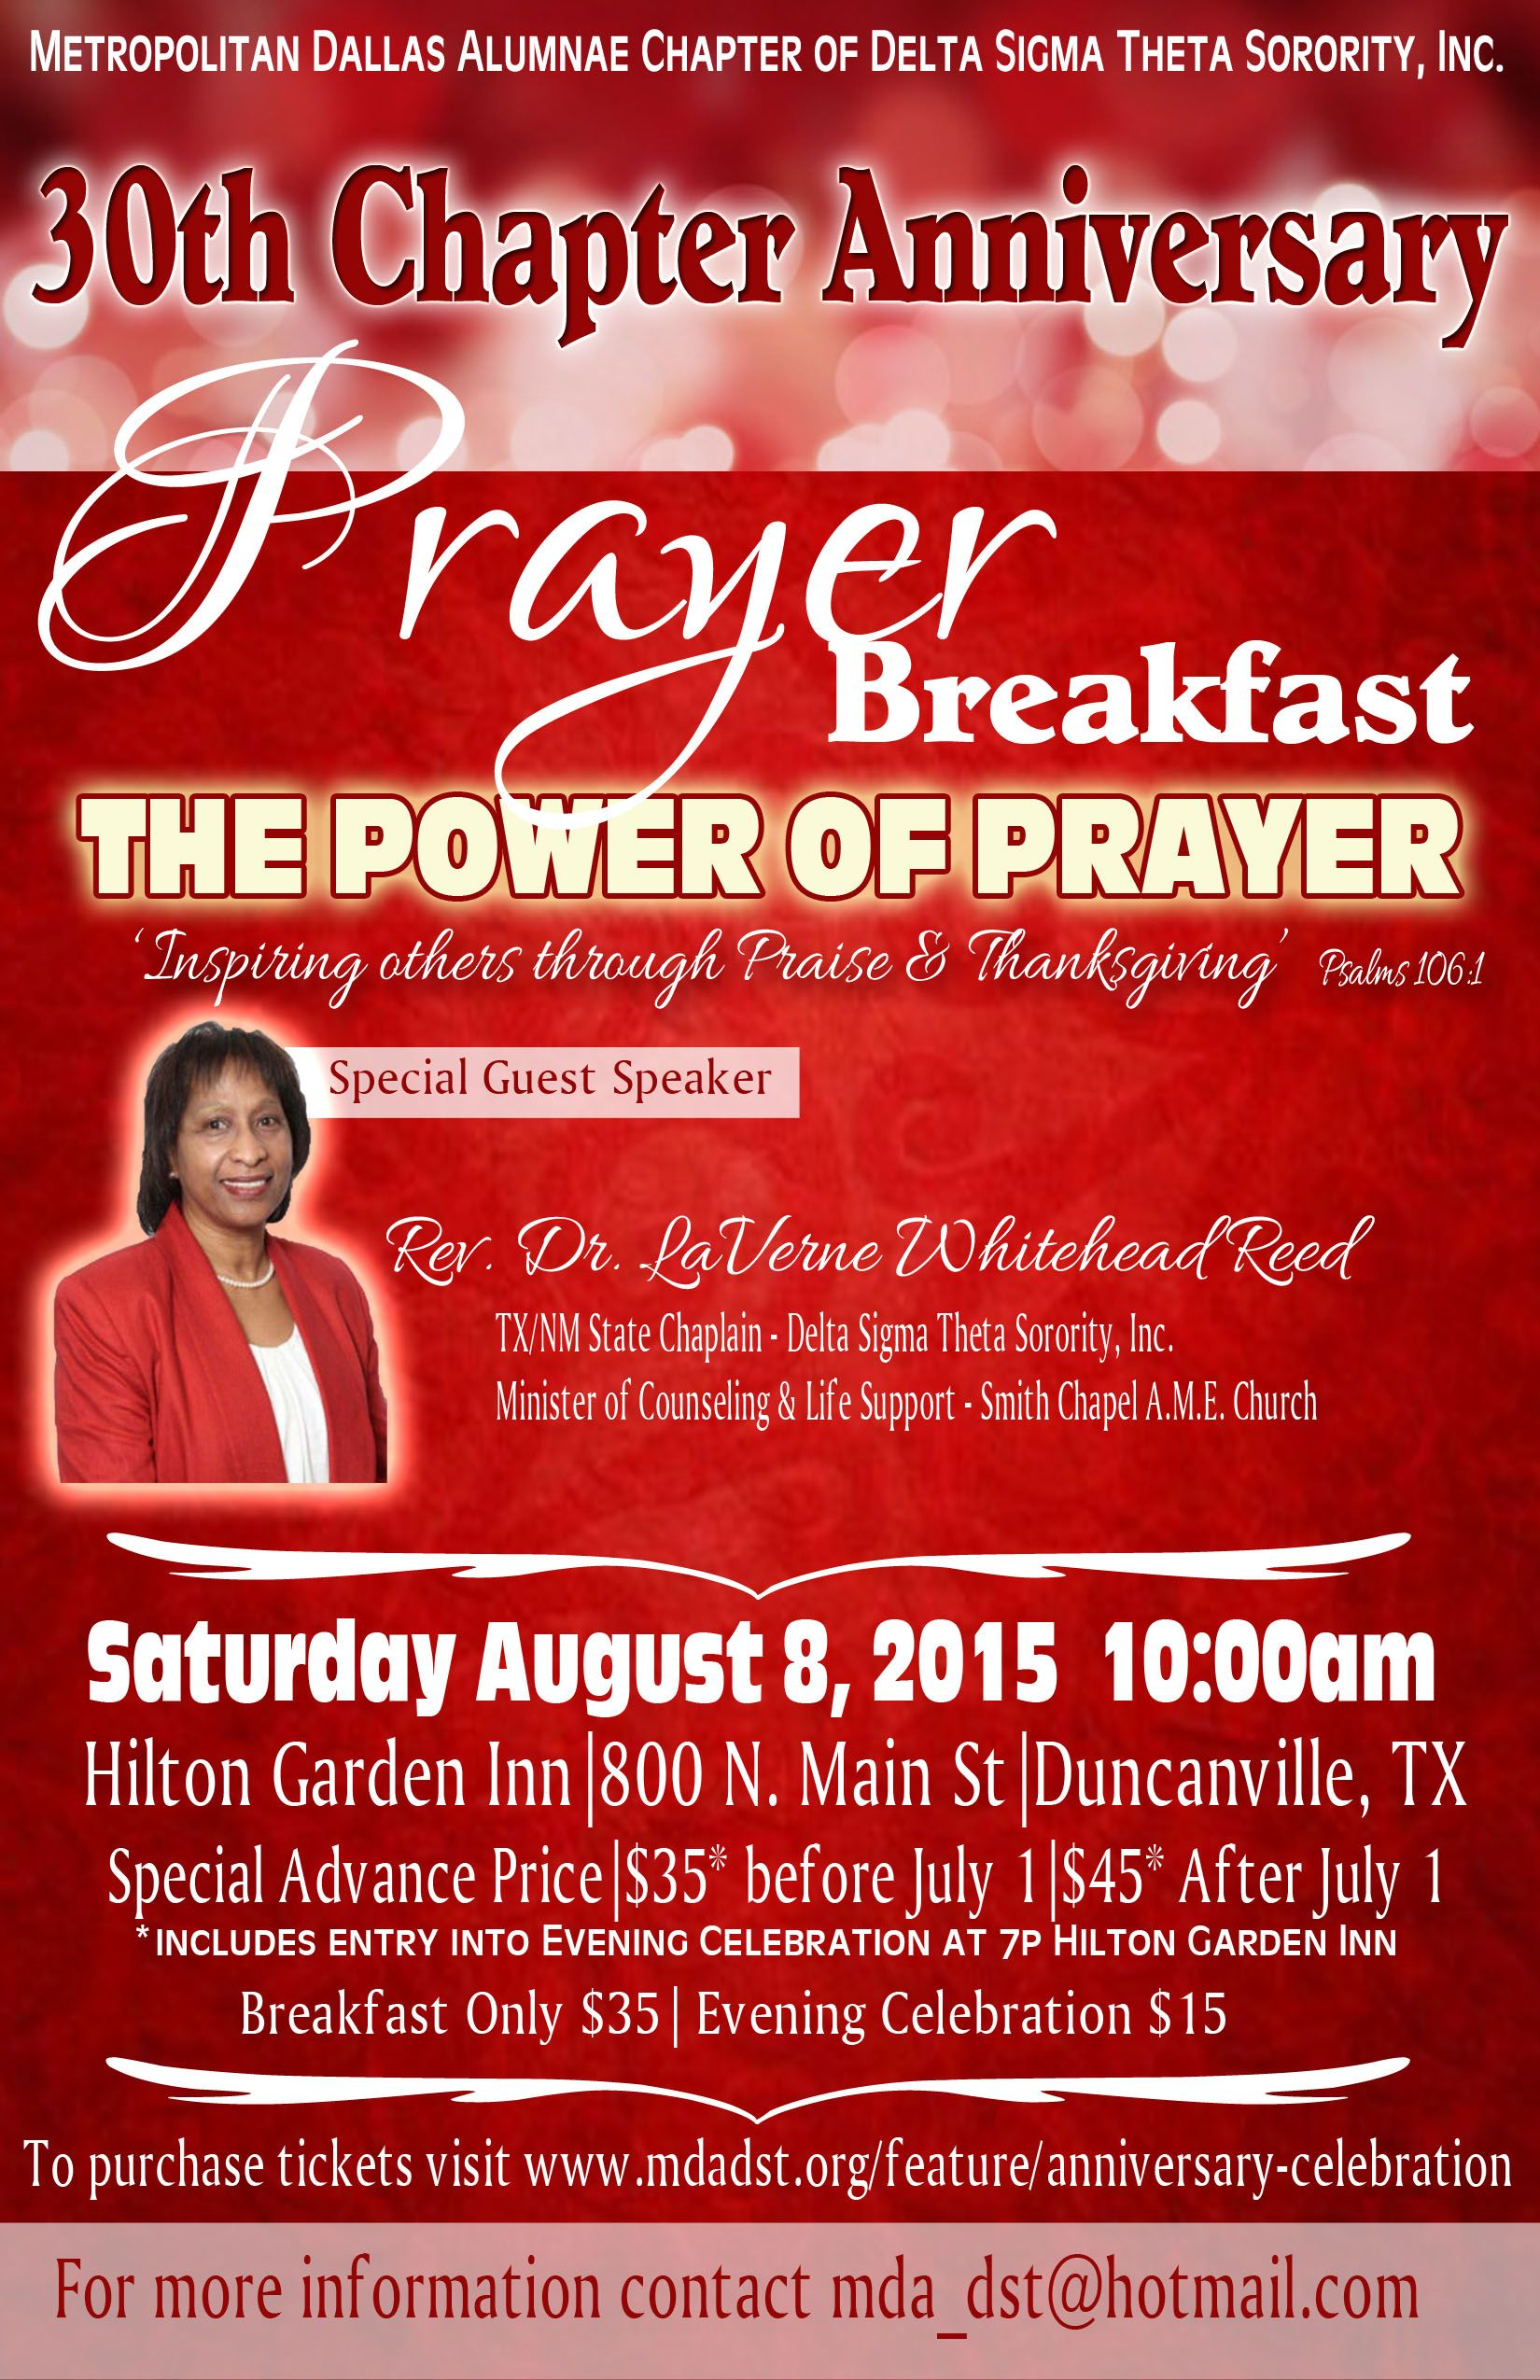 prayer breakfast themes - Google Search | Church ideas | Pinterest ...